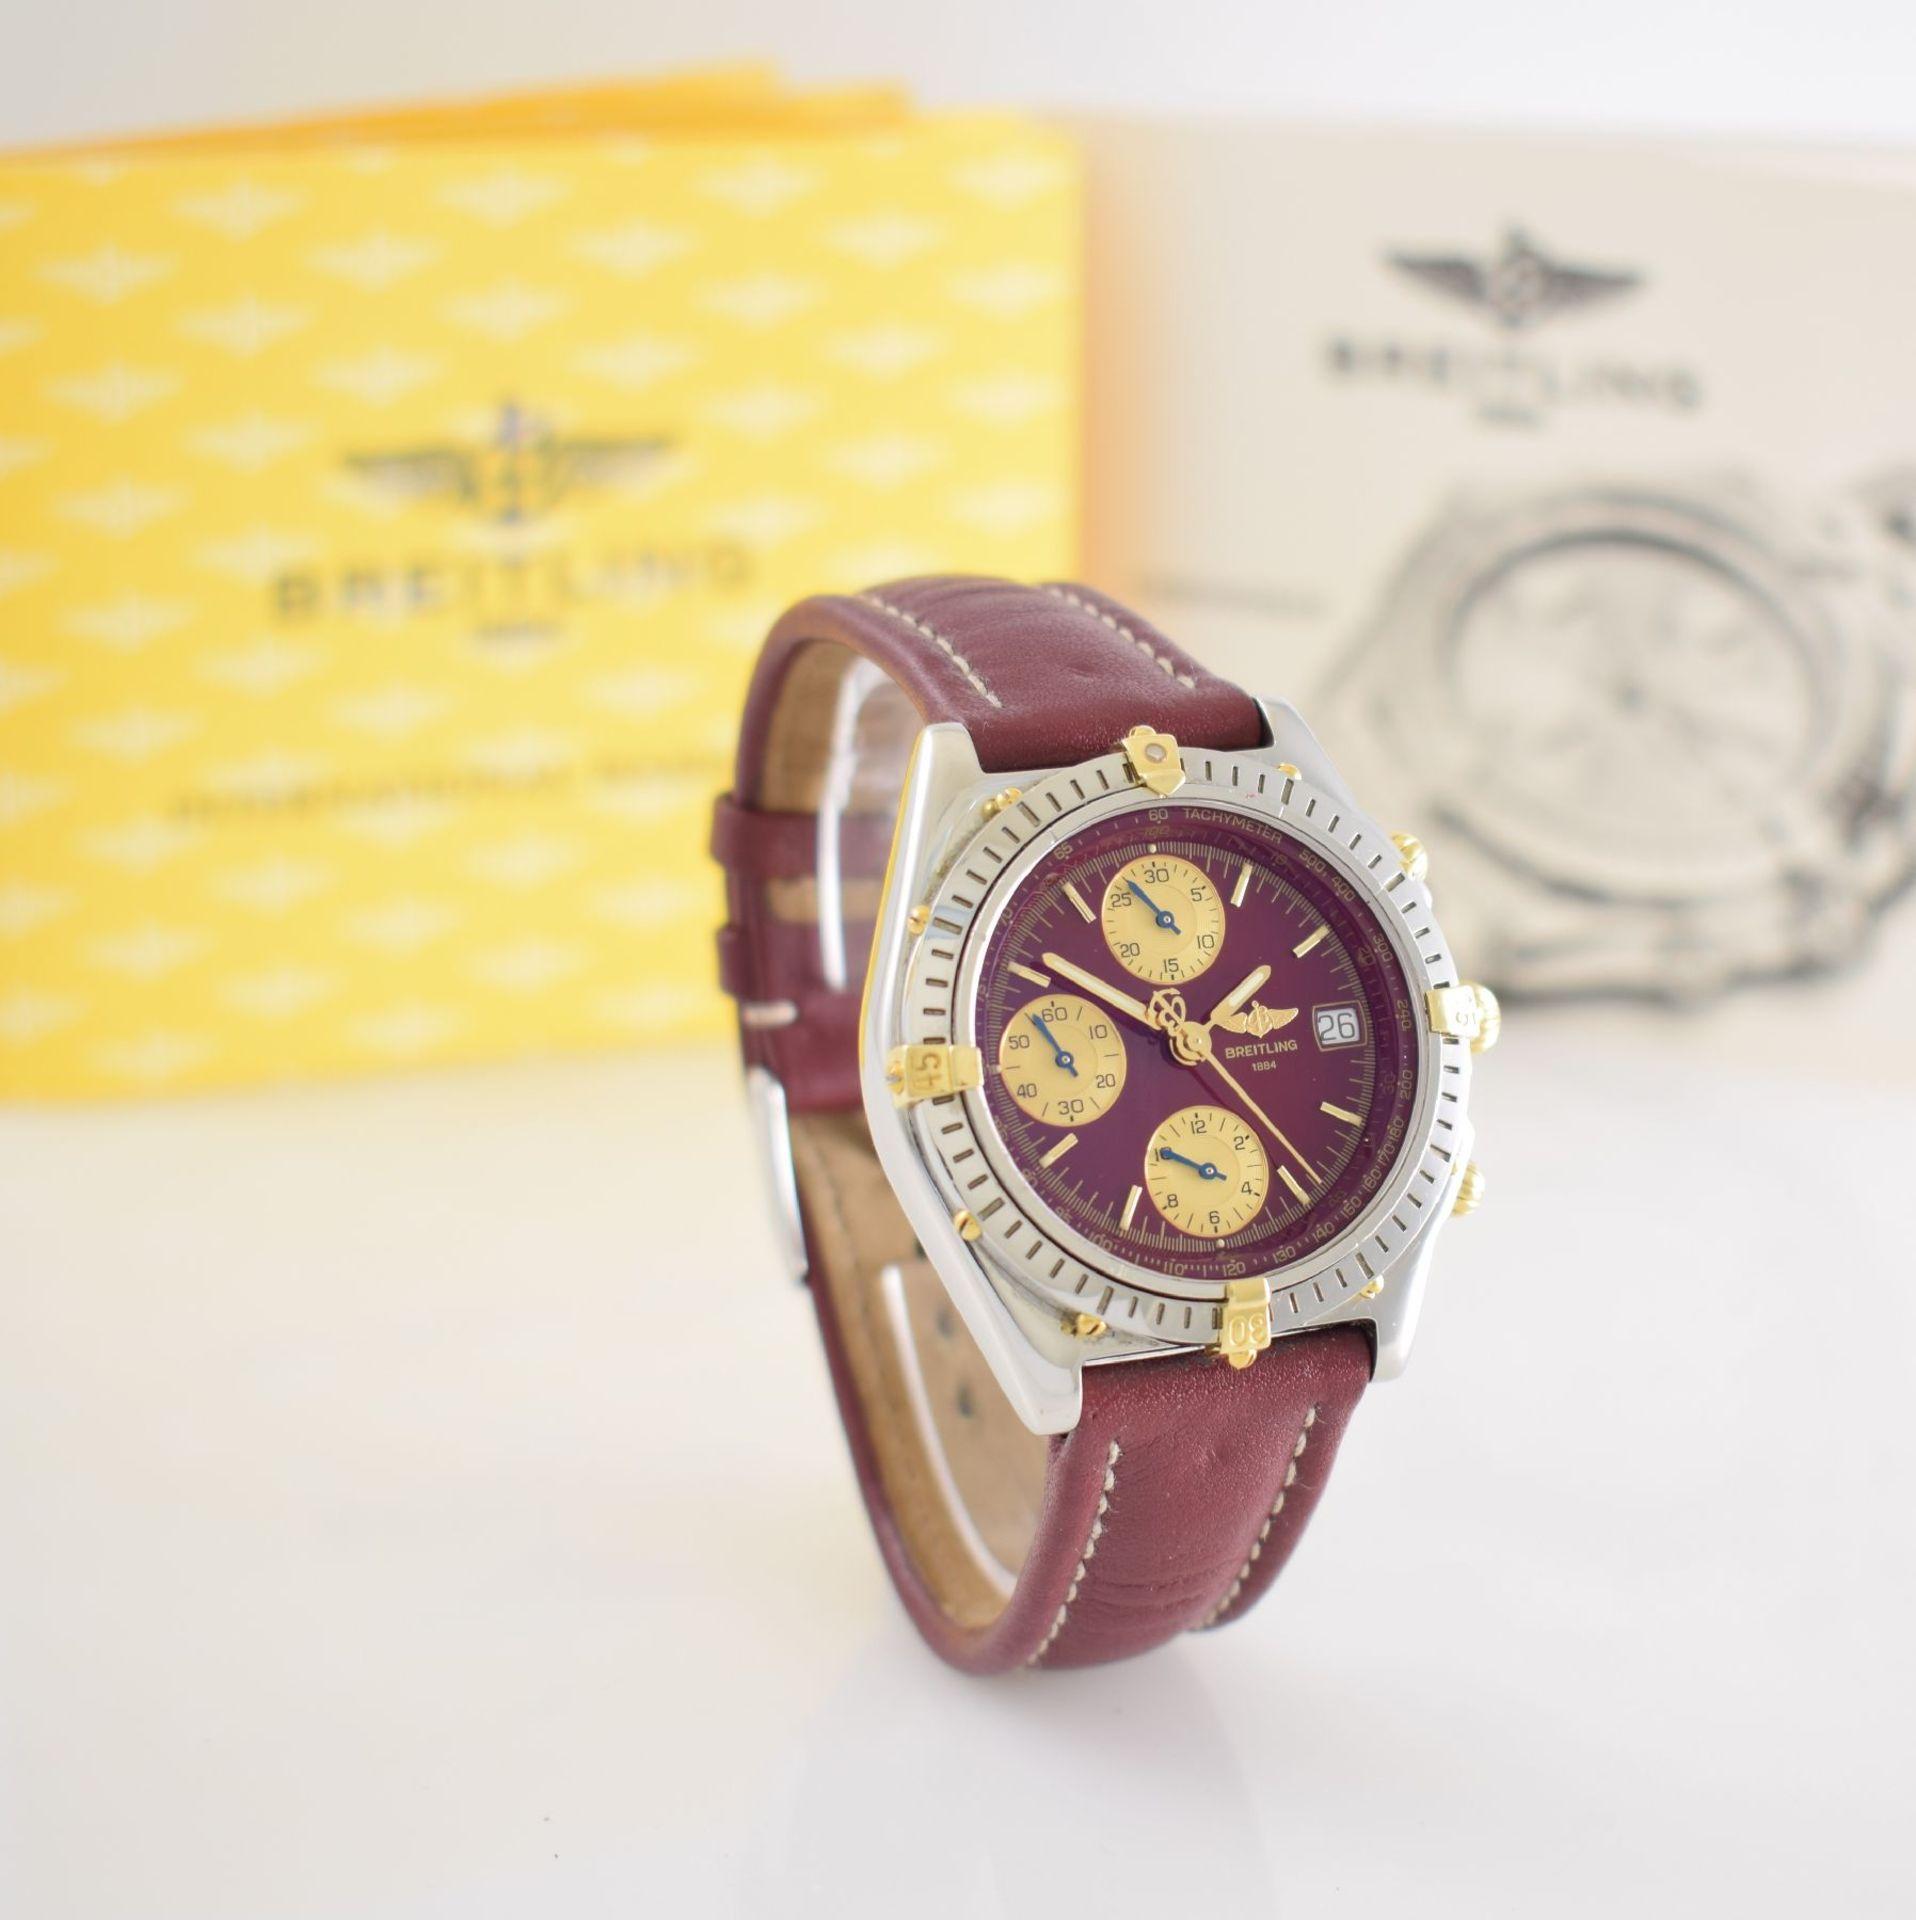 BREITLING Chronomat Herrenarmbanduhr mit Chronograph, Schweiz verk. lt. beil orig. Garantiekarte - Bild 6 aus 8